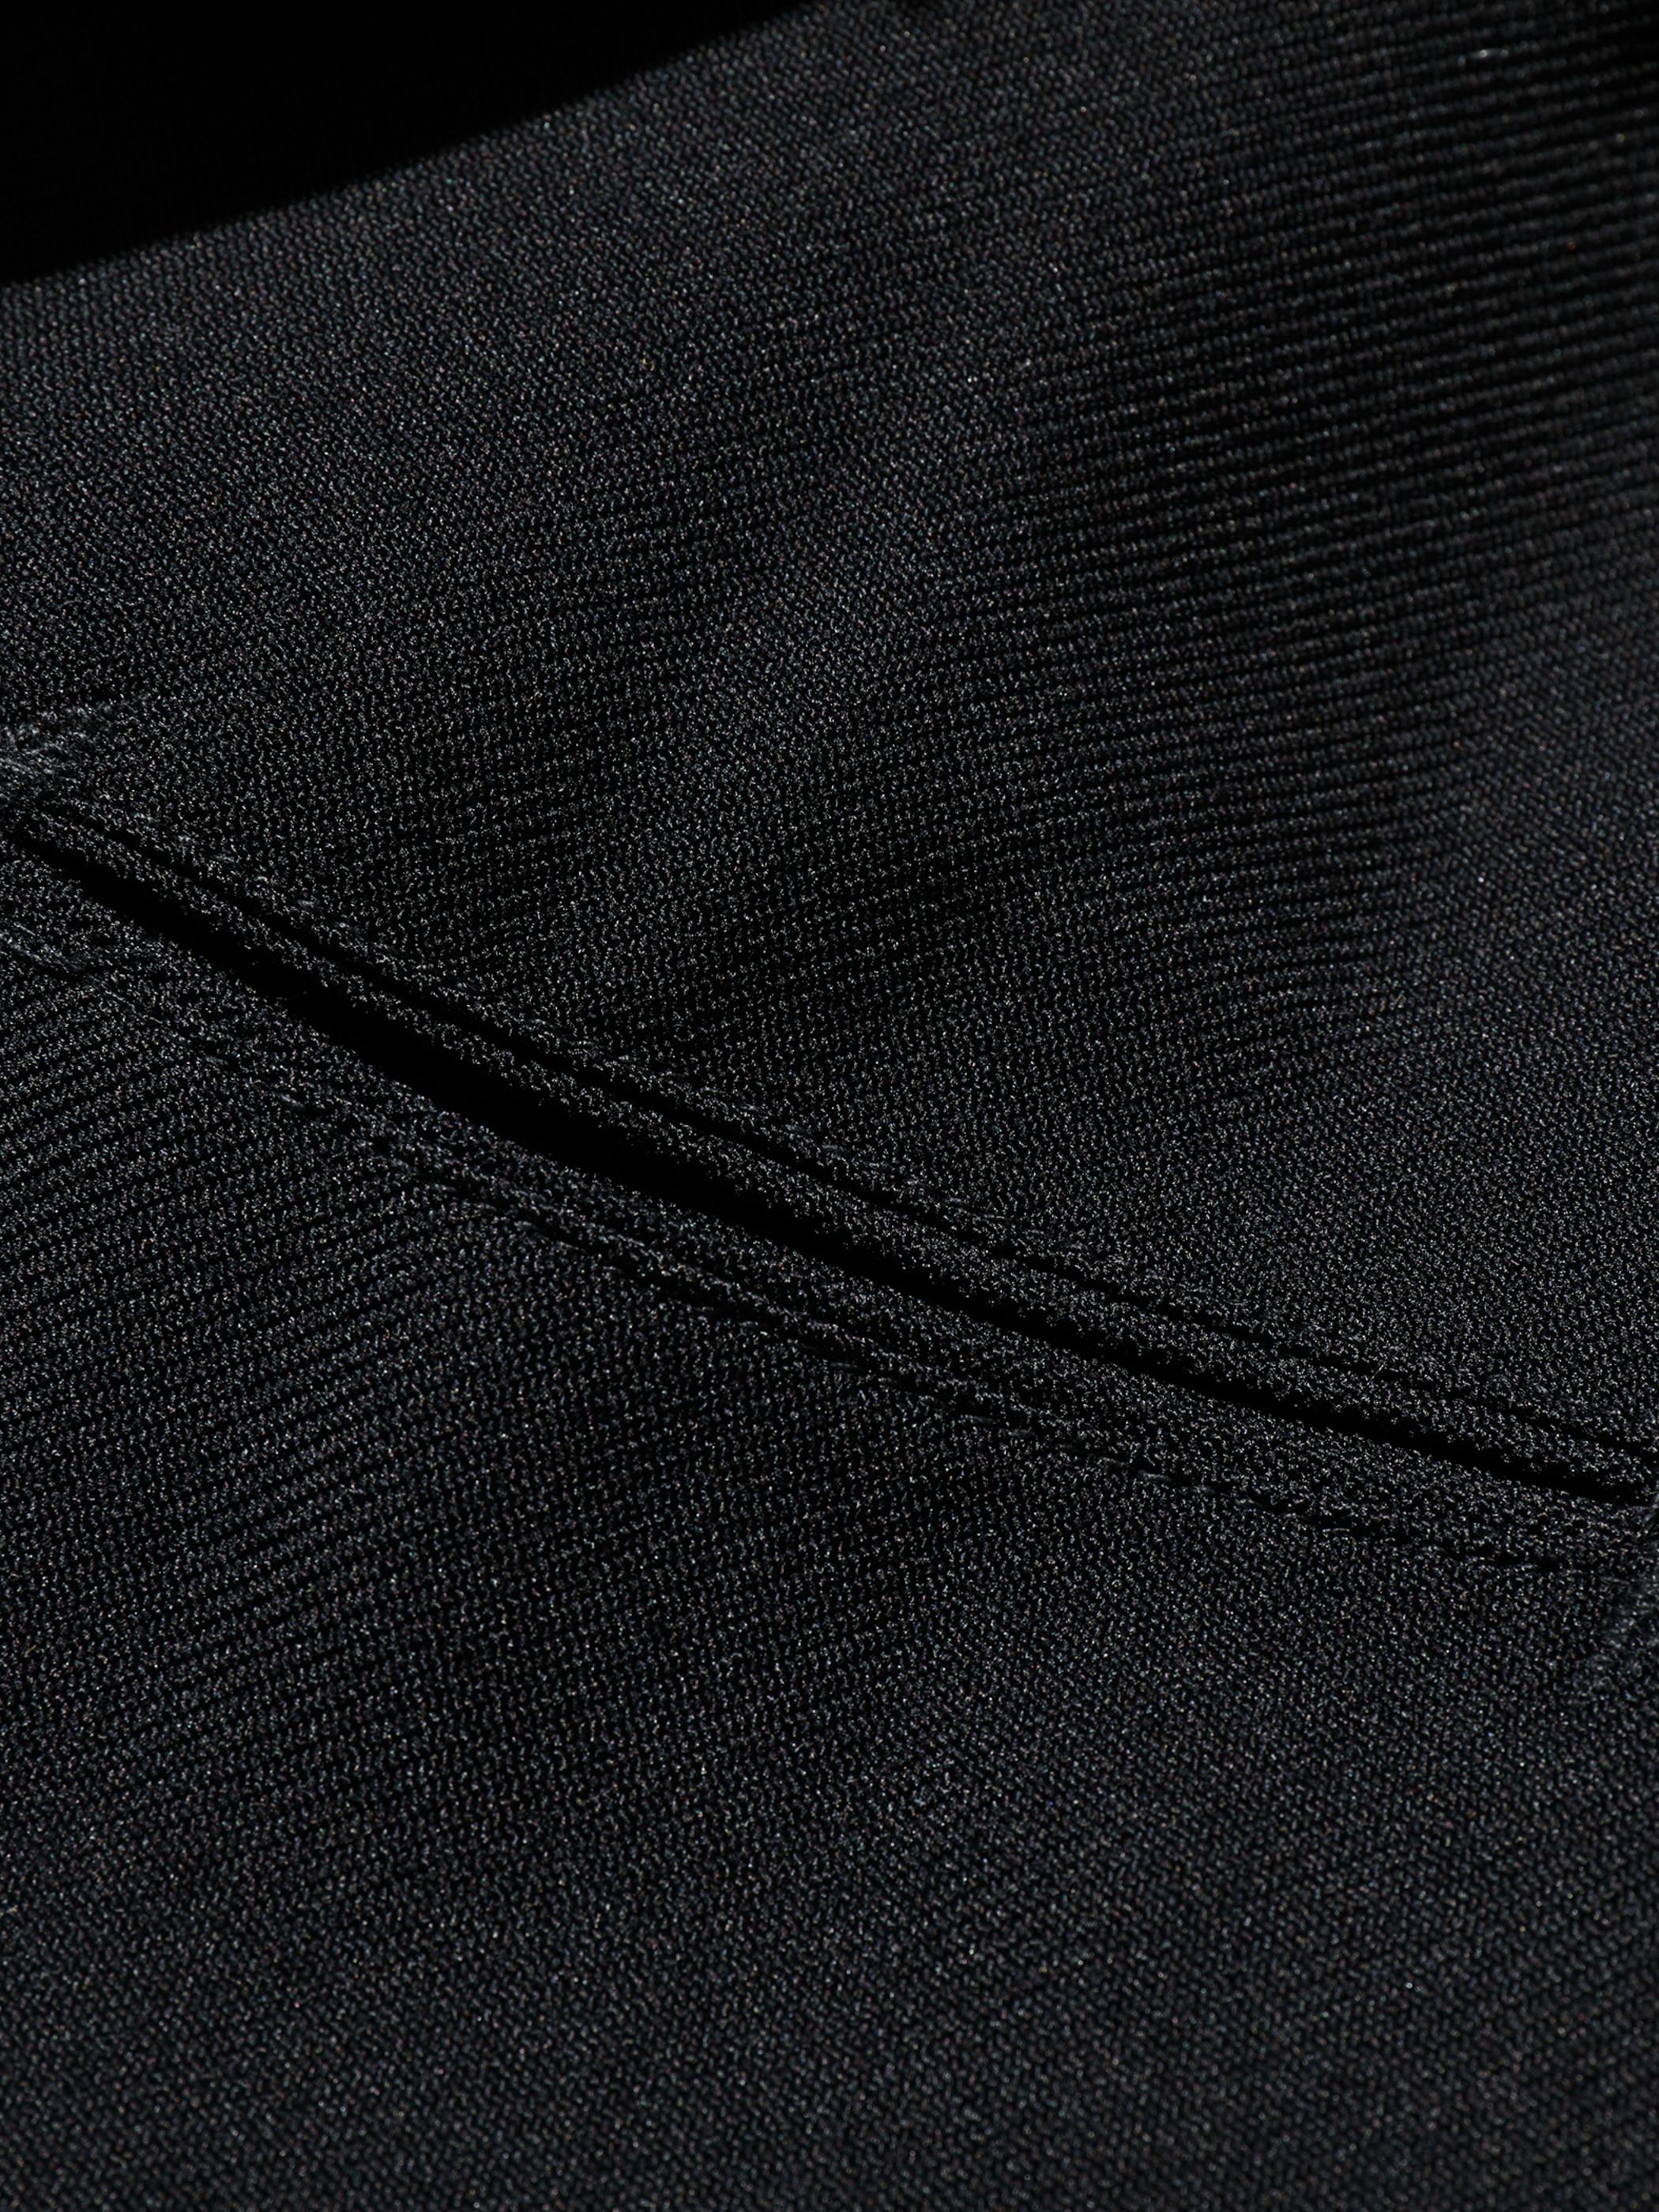 "1970's U.S.Navy / ""Experimental Garment"" Sailor Uniform"